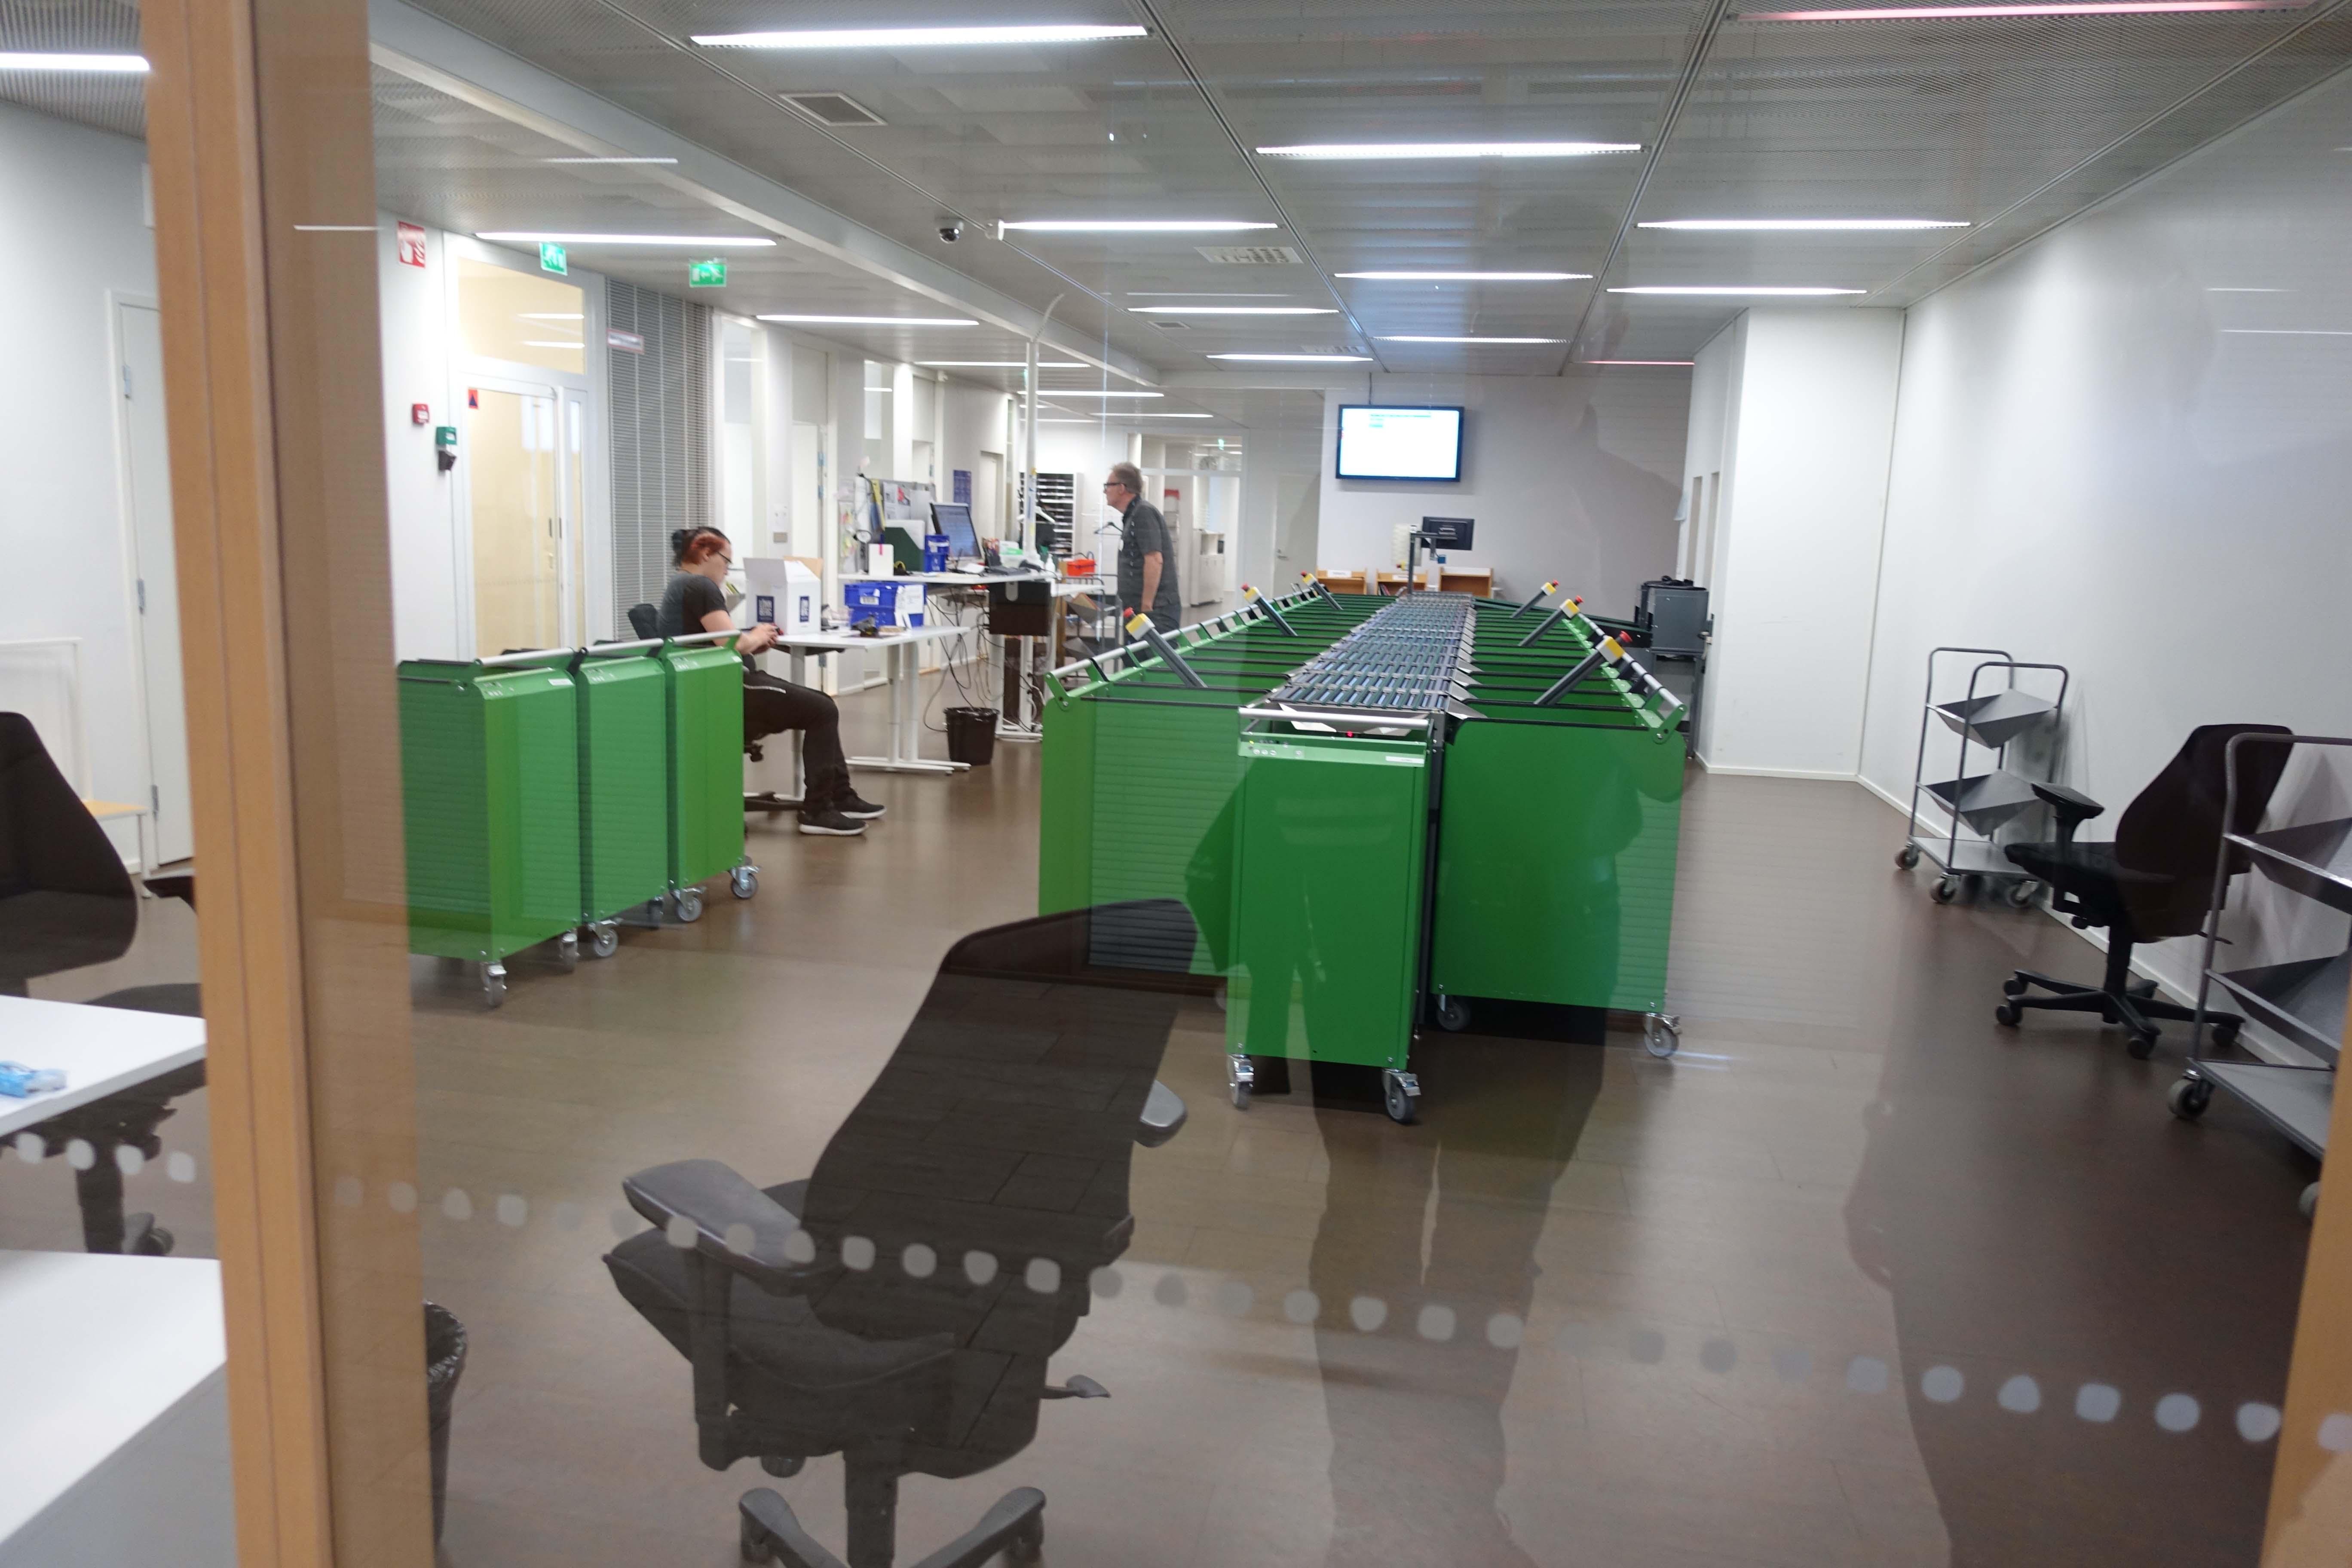 Helsinki University Library 13